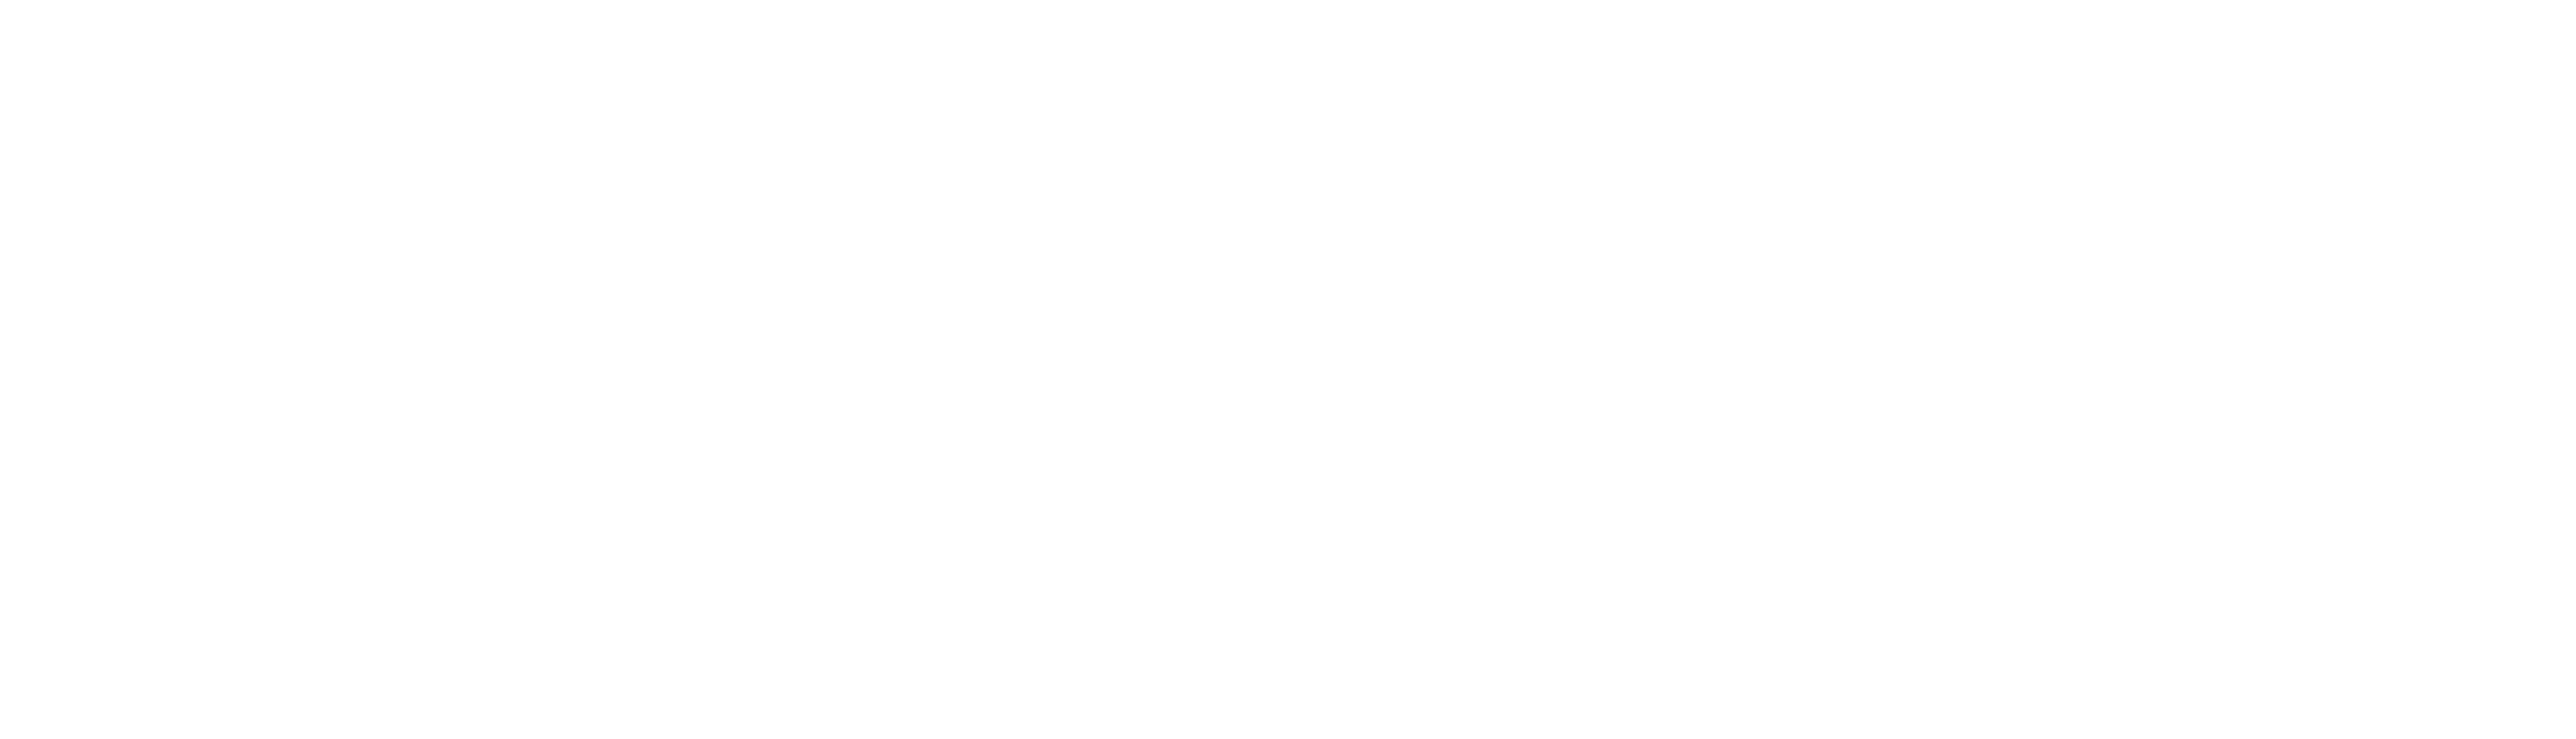 Digital Marketing Consulting Agency